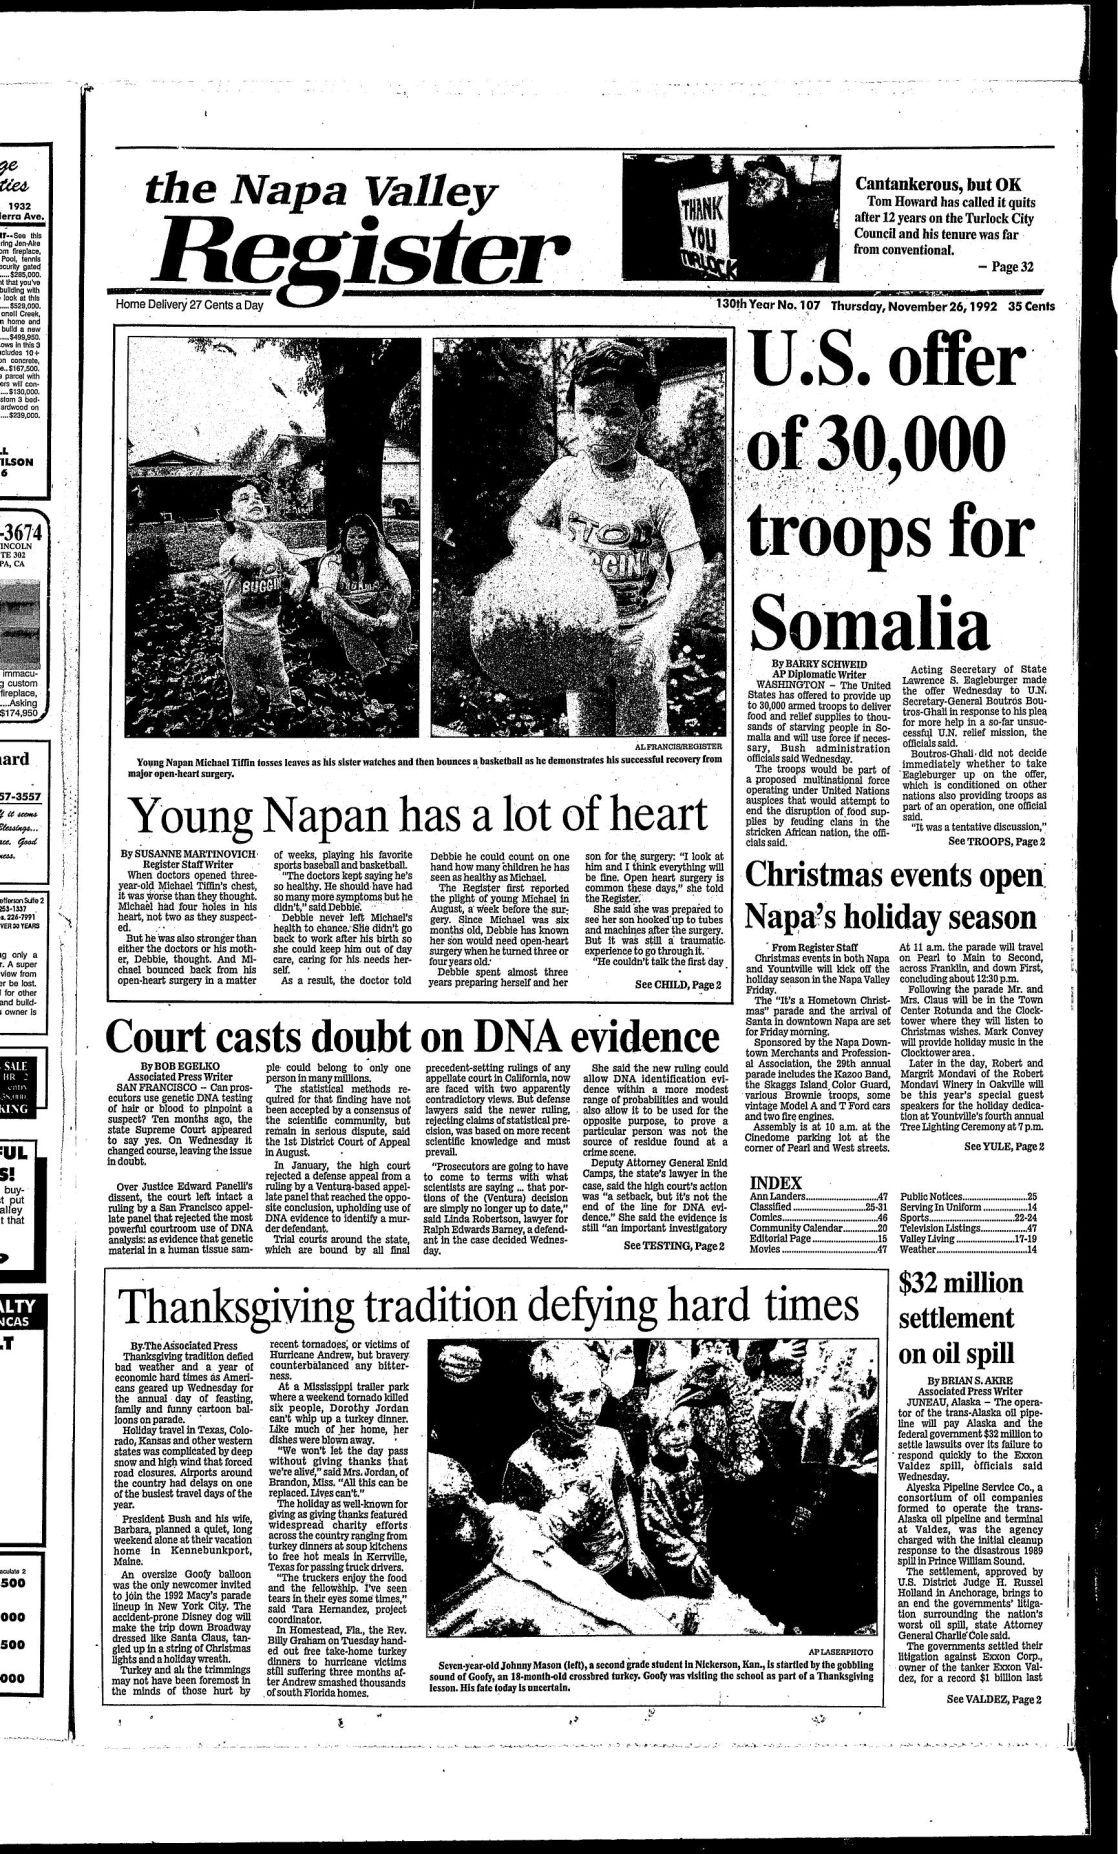 Nov. 26, 1992